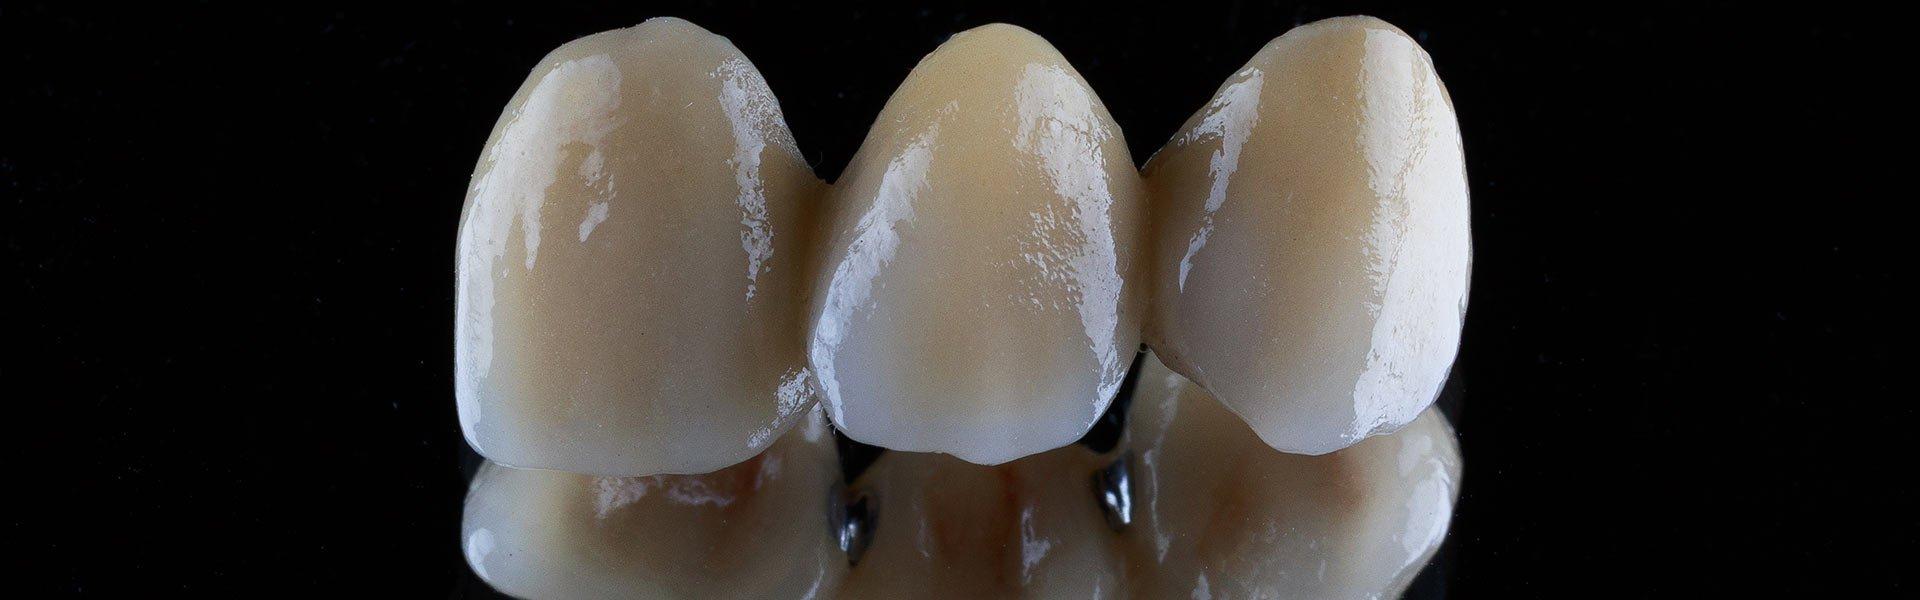 Dental bridge on black background